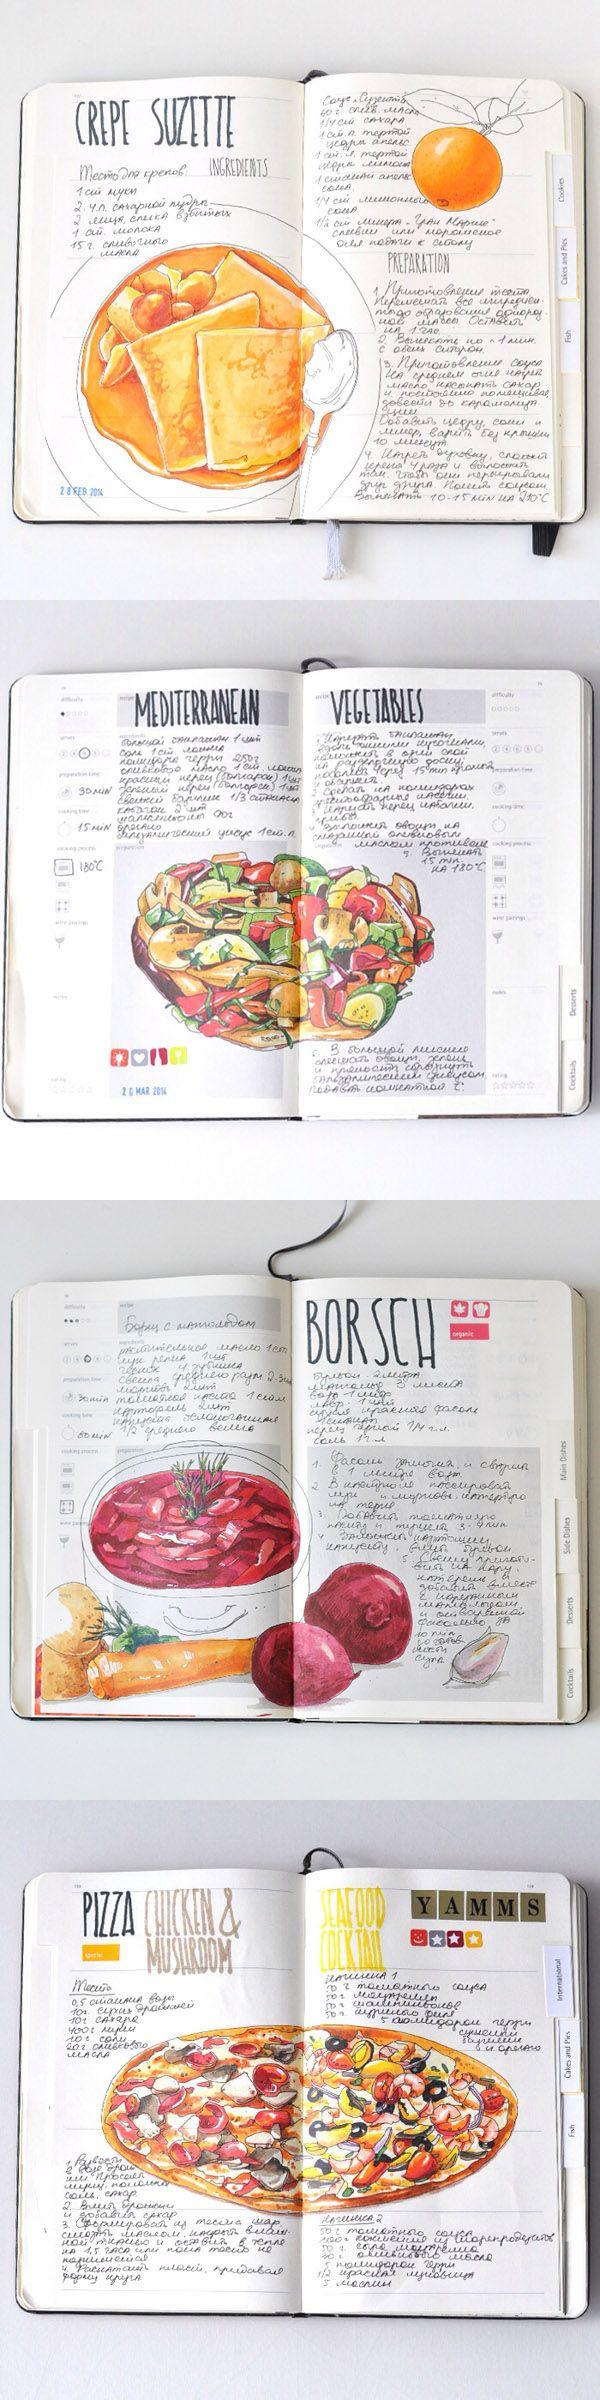 Recipe journal 2014 by Sally Mao//